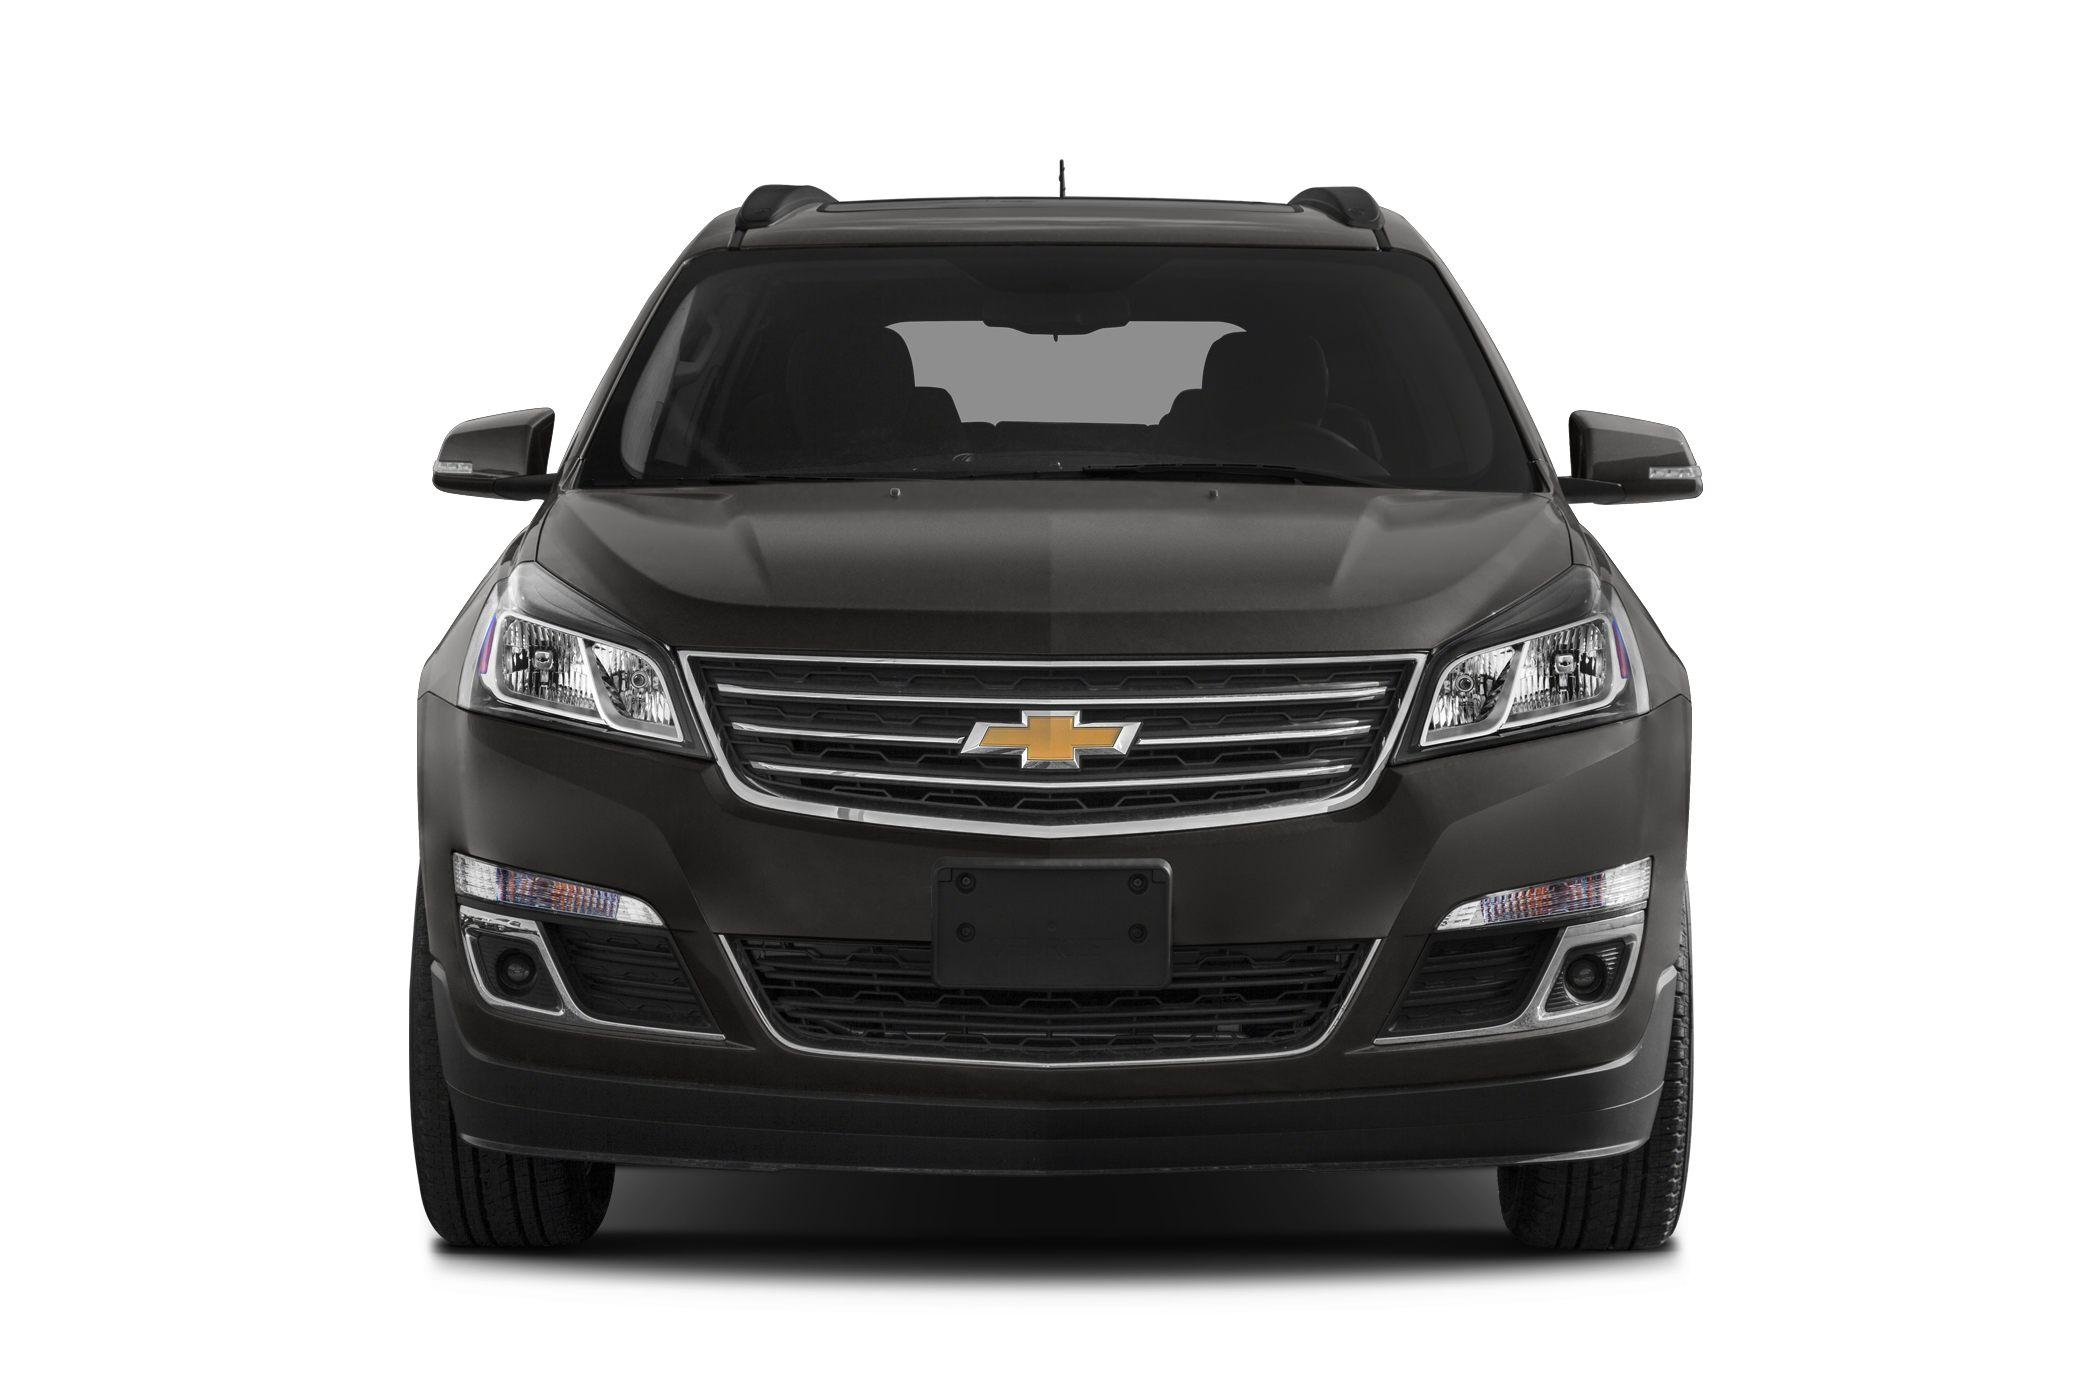 parison Chevrolet Traverse SUV 2015 vs Chevrolet